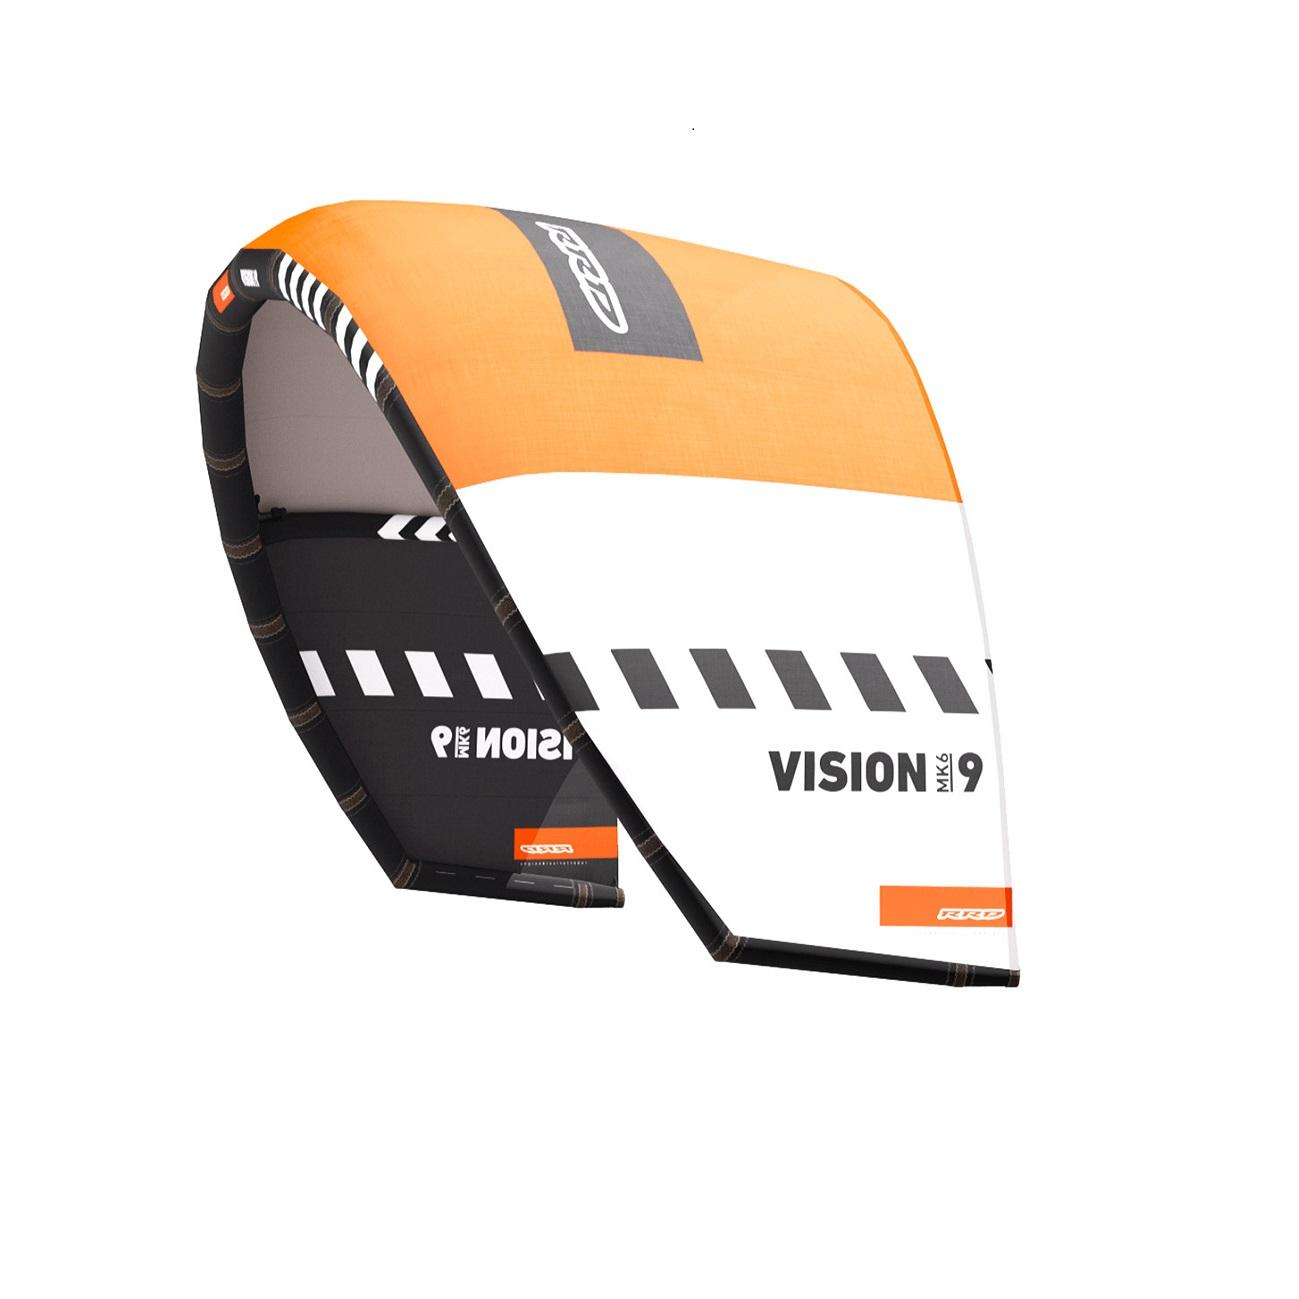 rd_vision_mk6_2019